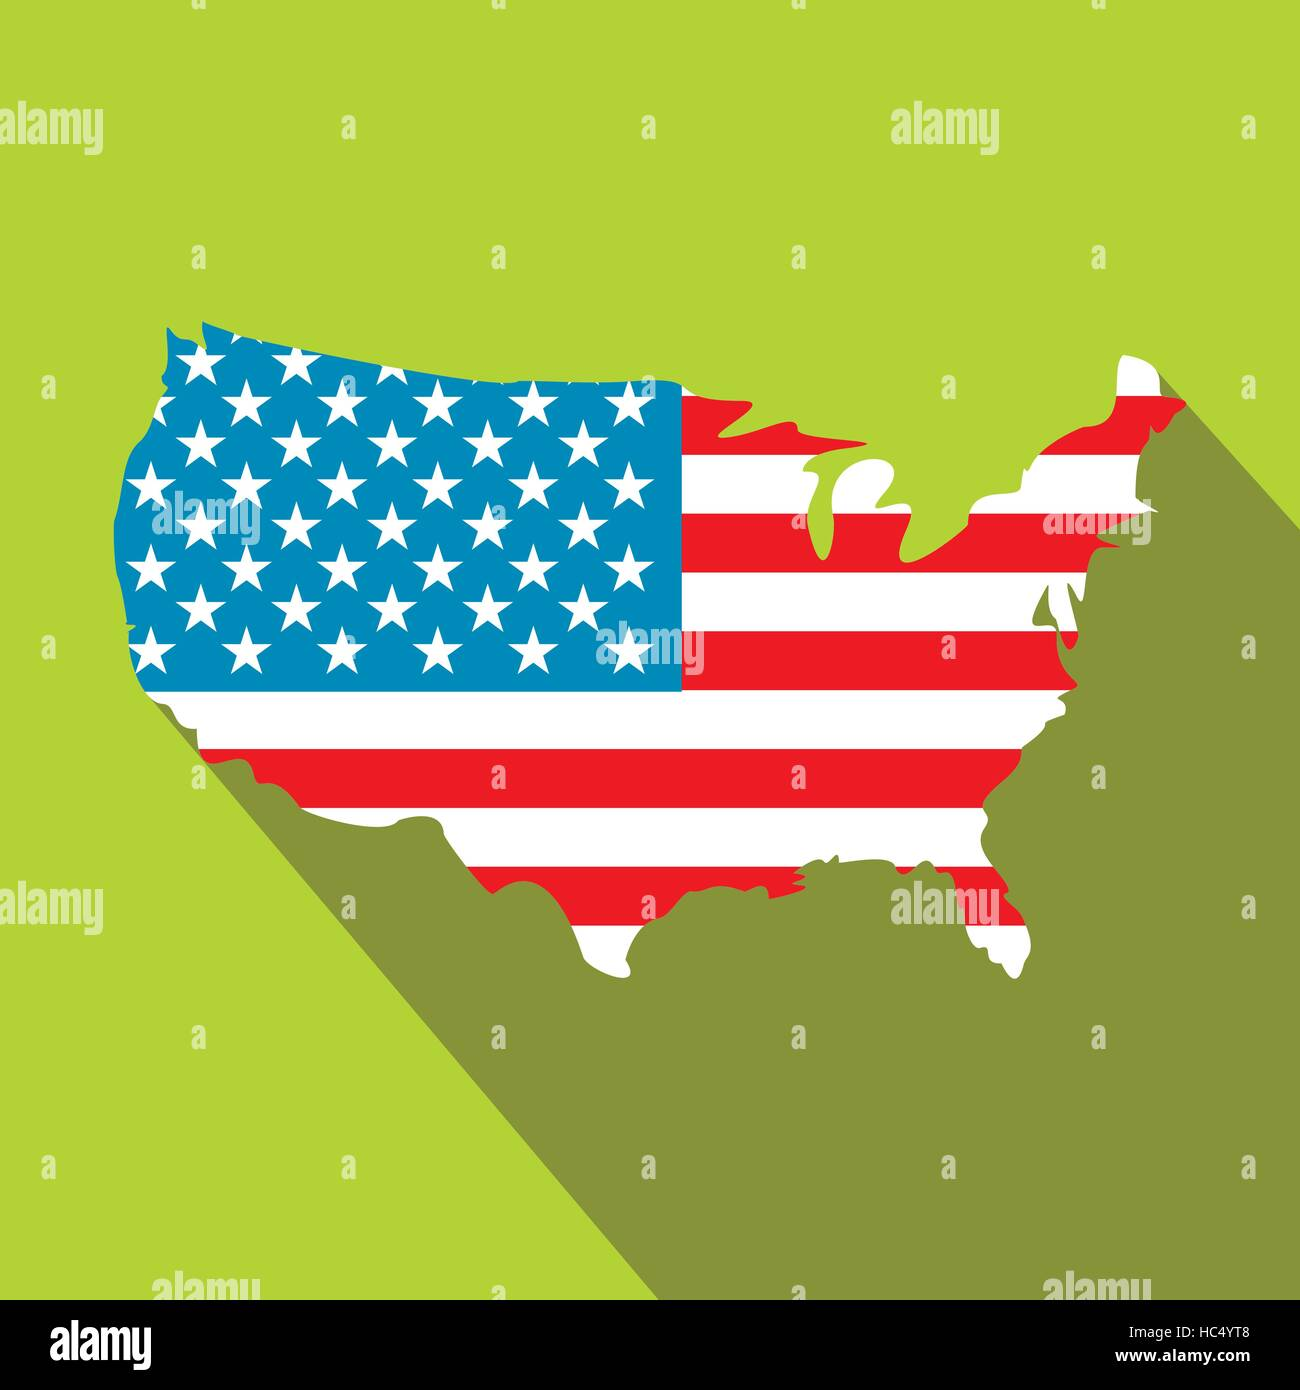 USA Map Flag Flat Icon Stock Vector Art Illustration Vector - Us map flat